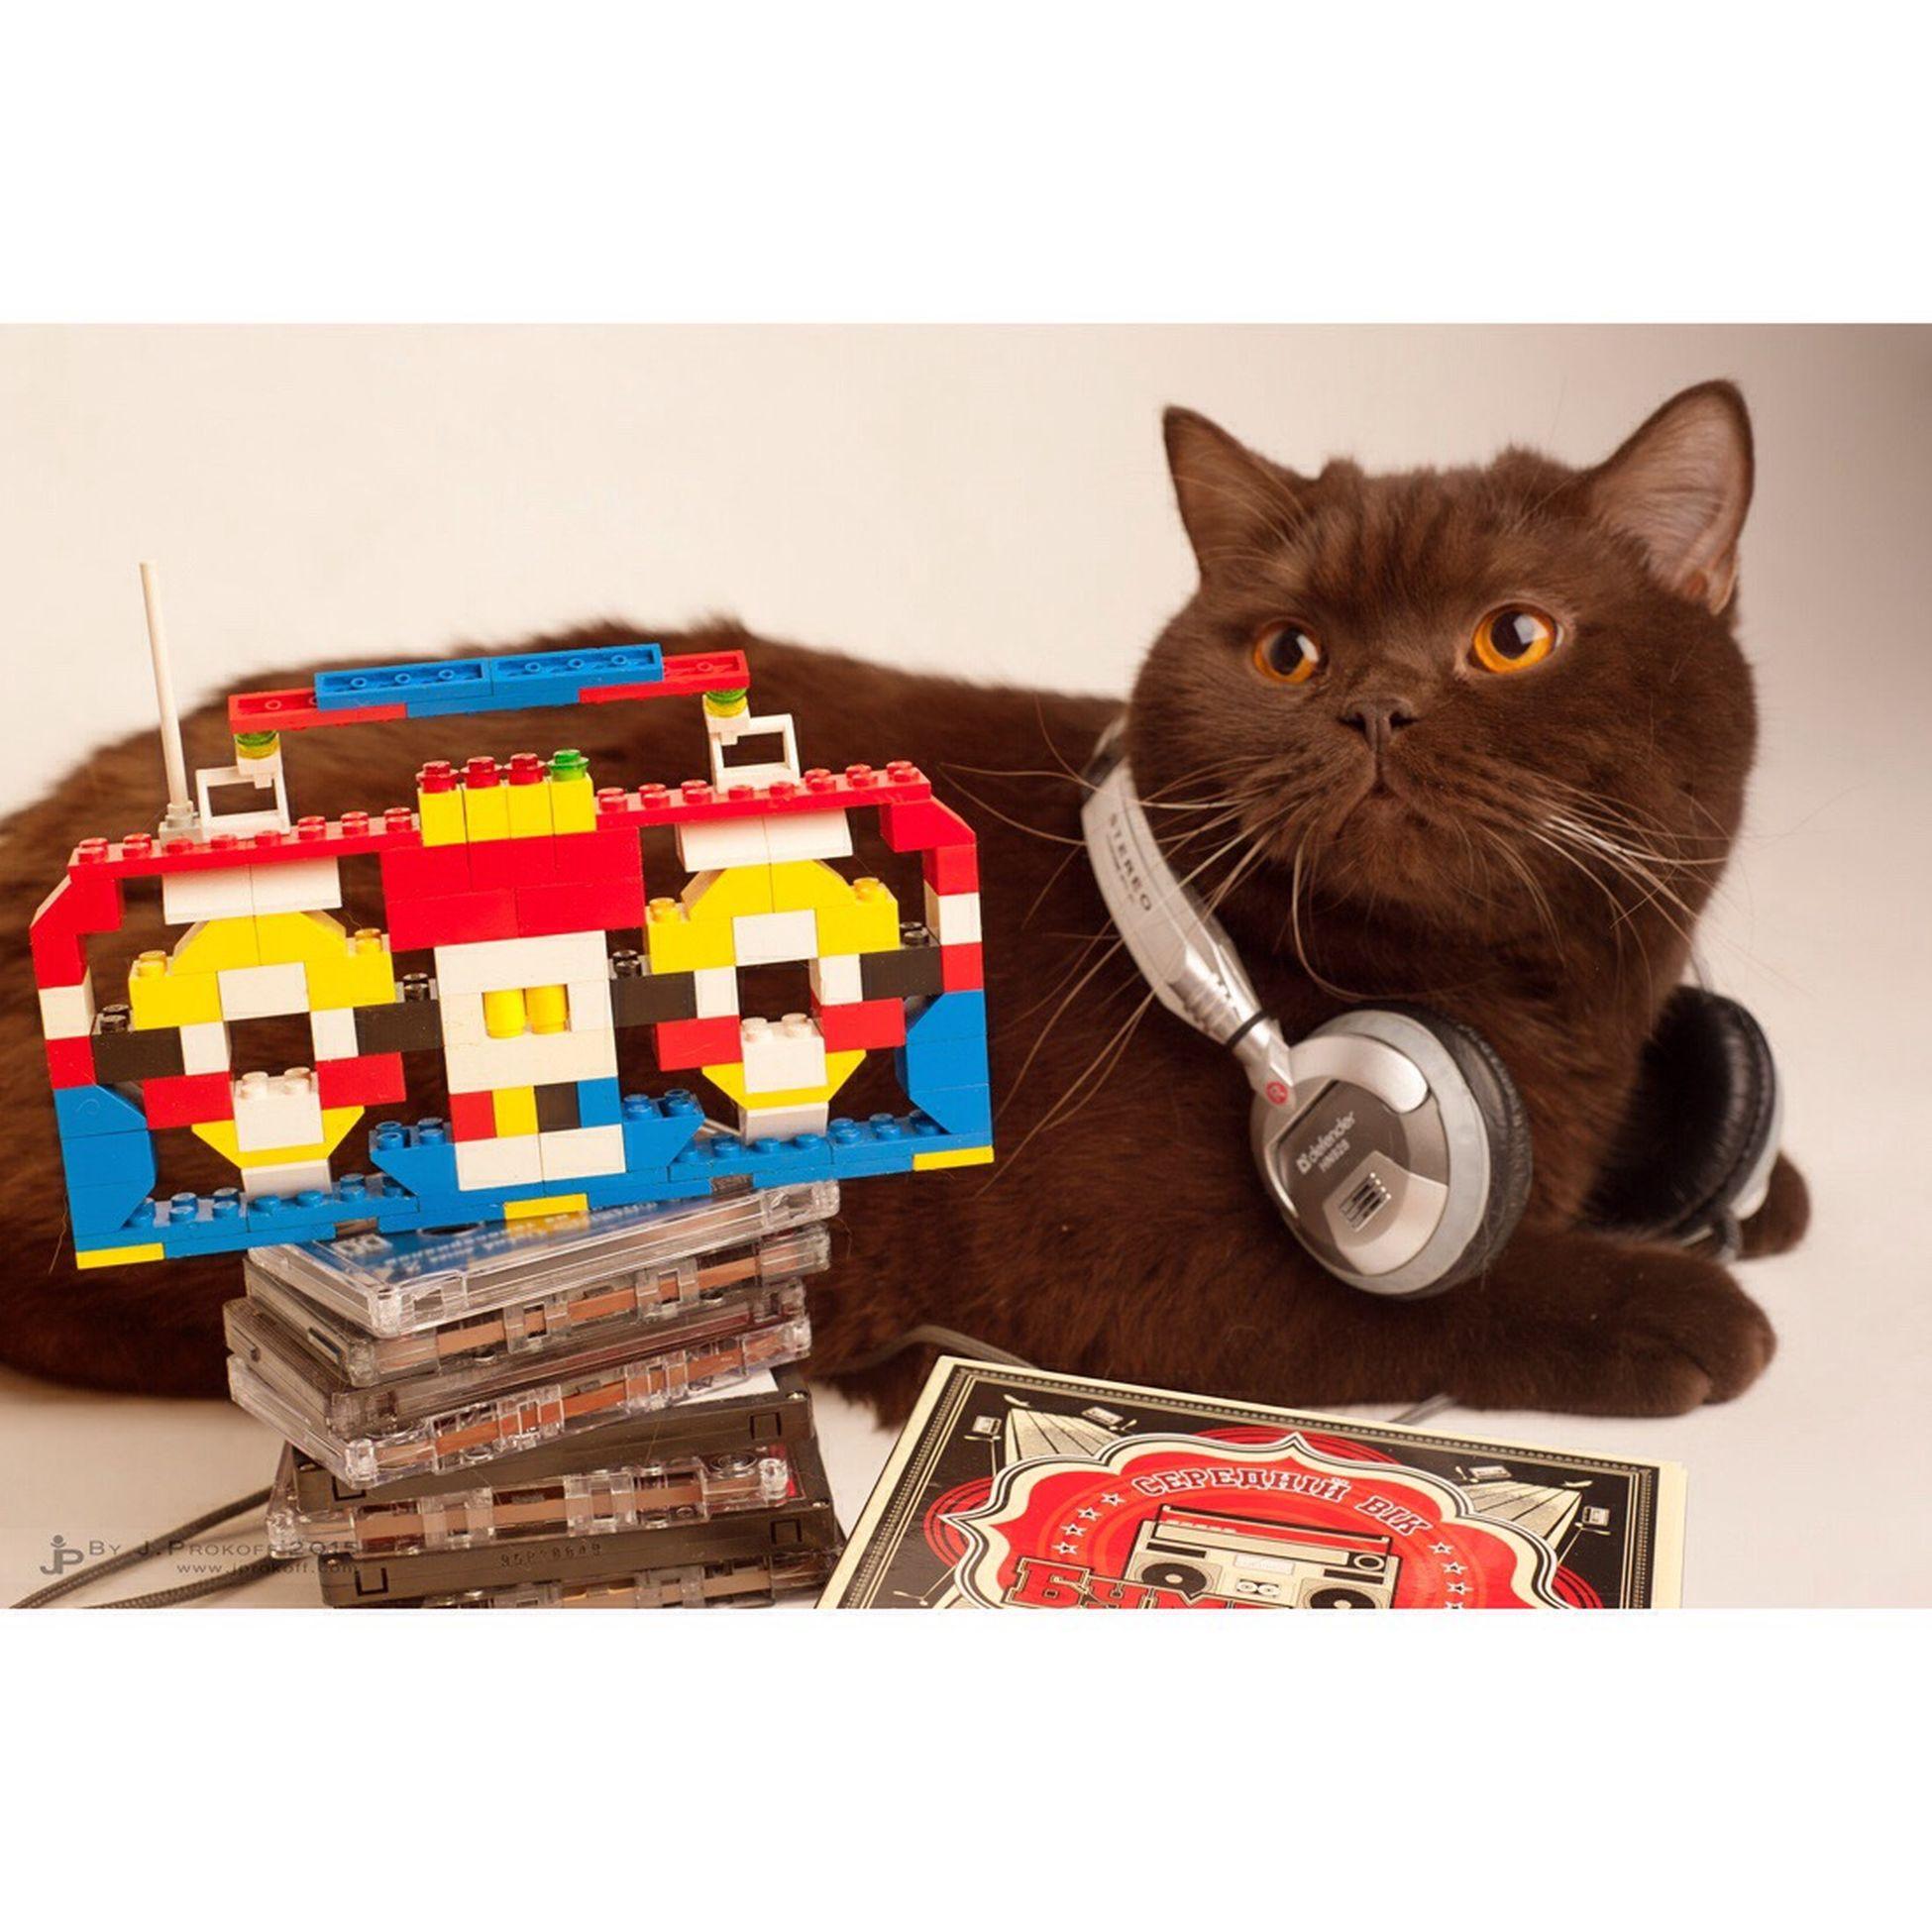 Boombox&Oliver. 🎶😸 Music Boombox Cat Britishshorthair Oliver Mycat British Home оливер риф кот люблюкота британец шоколад Chocolate бумбокс музыка Меломан лего LEGO